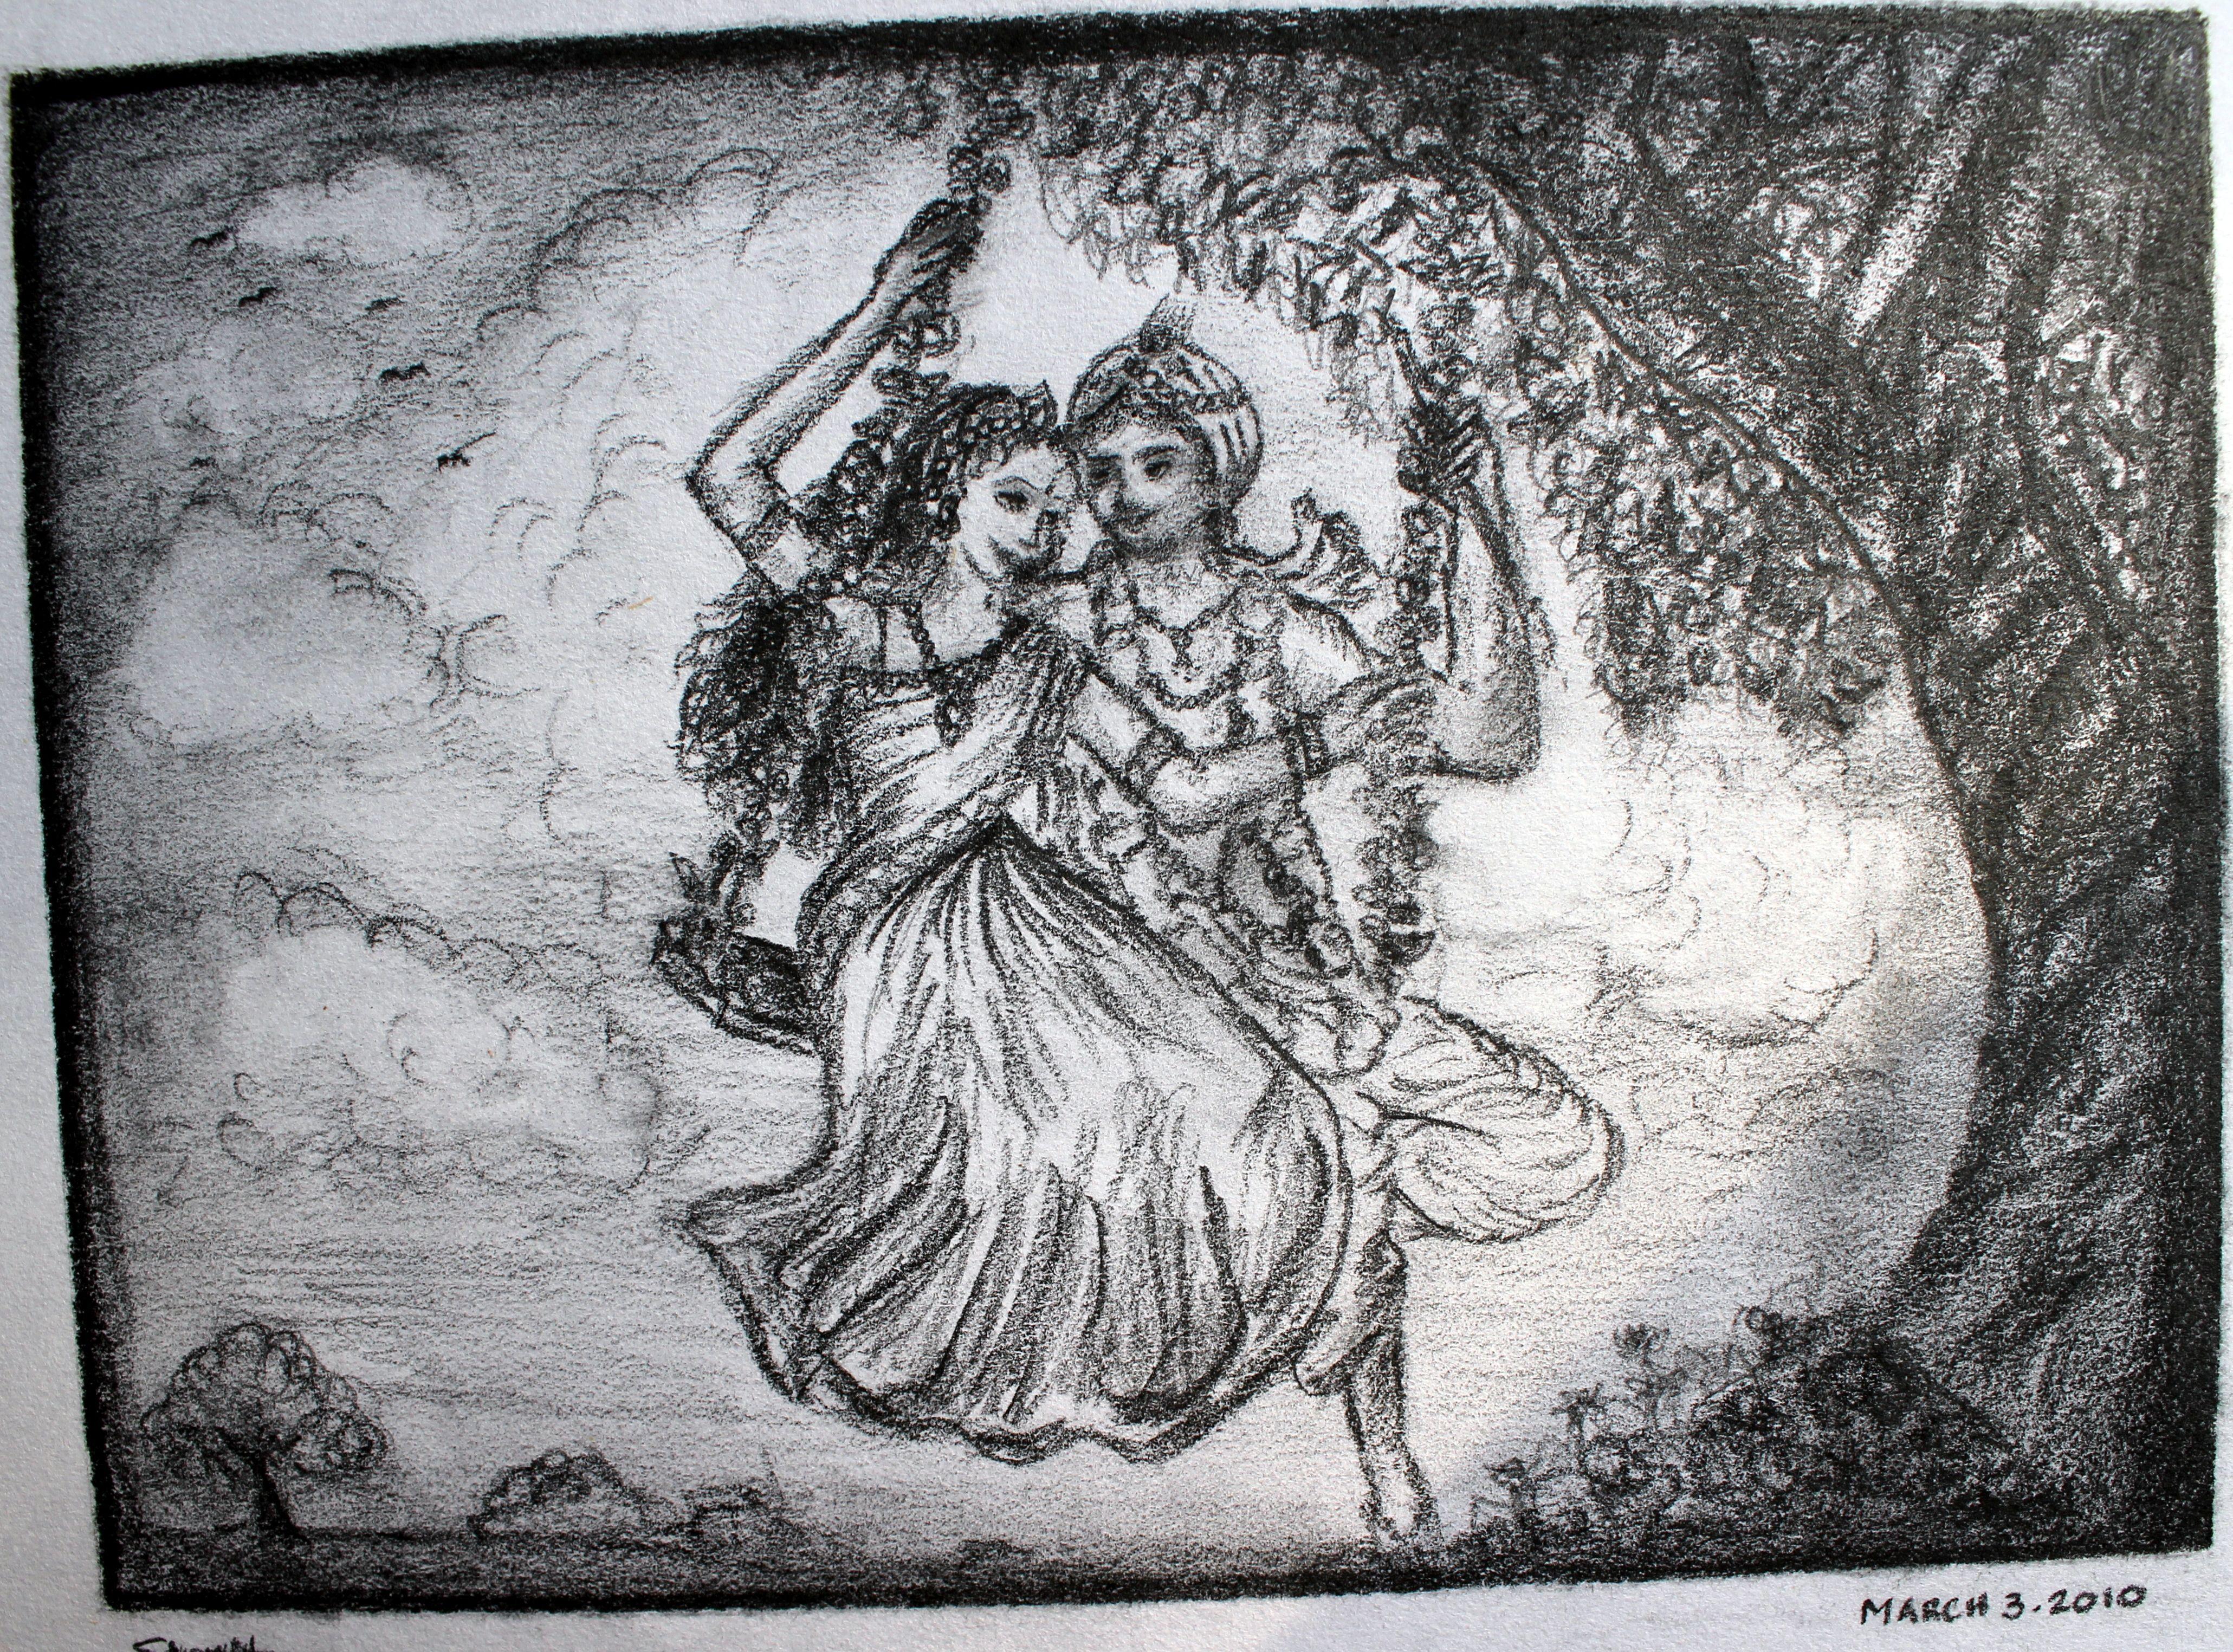 Radha Krishna On Swings Sketch | My Artwork | Pinterest | Krishna Sketches And Artwork